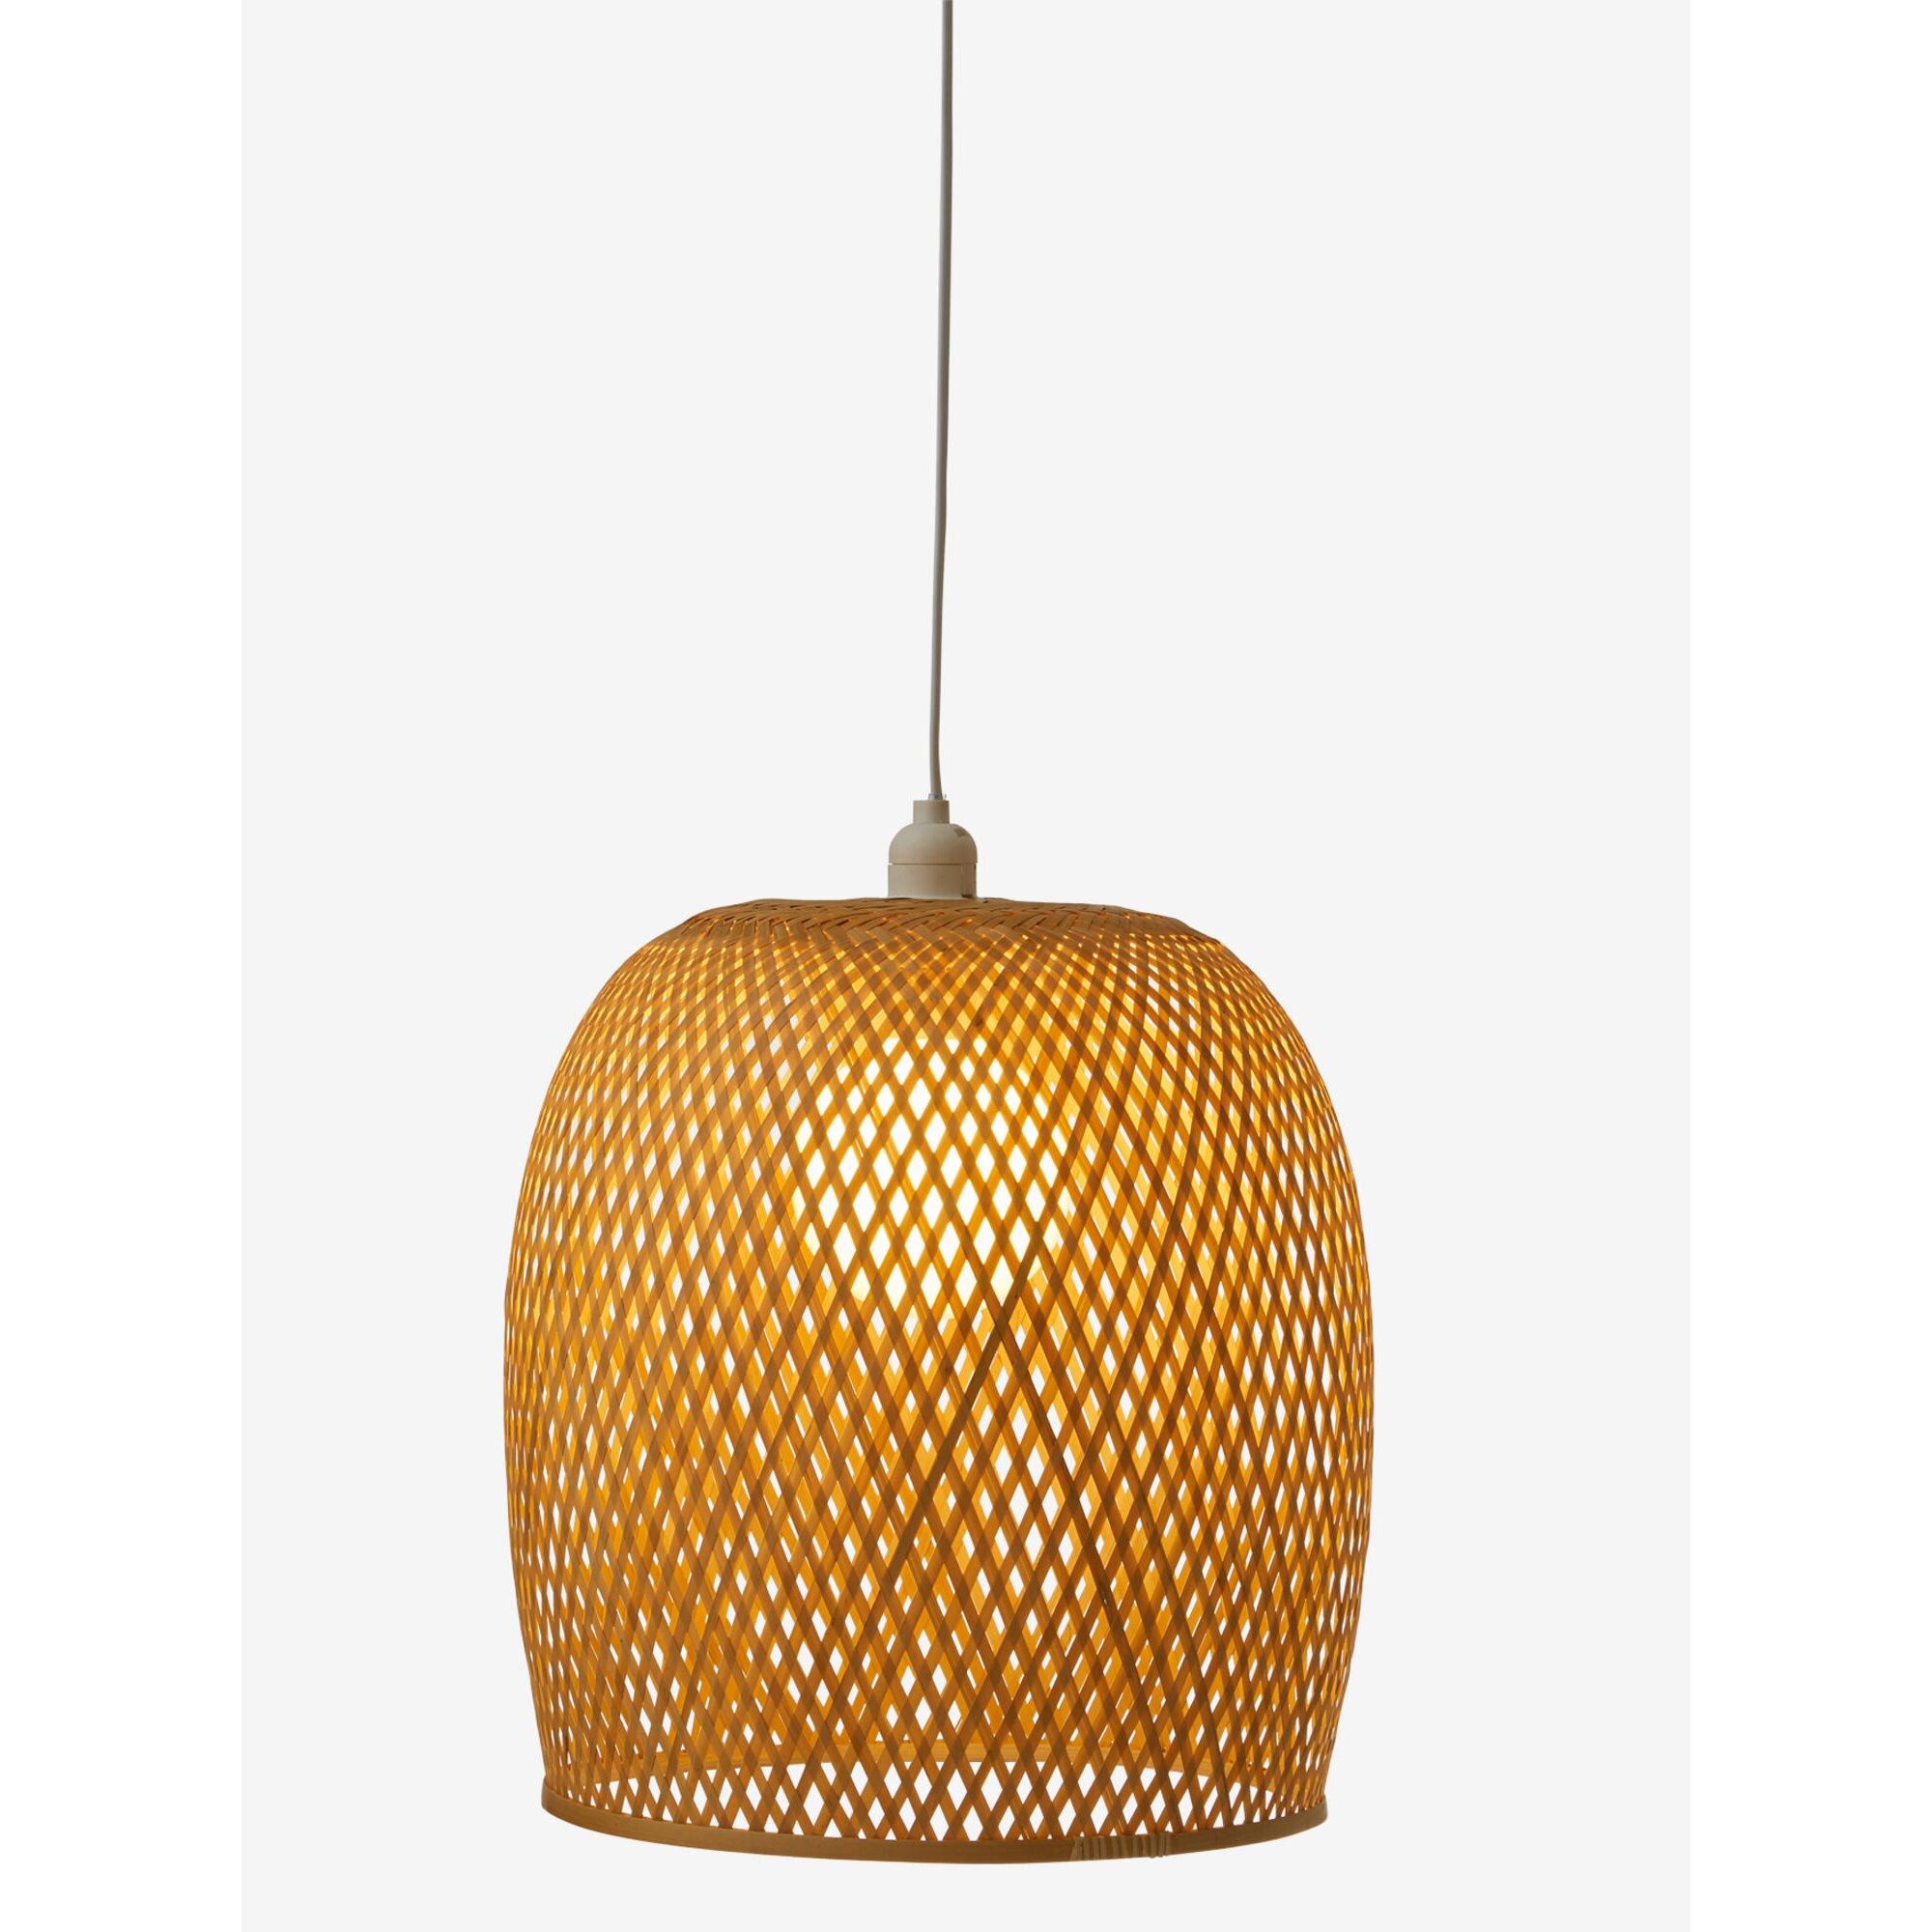 vertbaudet-lampenschirm-aus-bambusgeflecht-glockenform